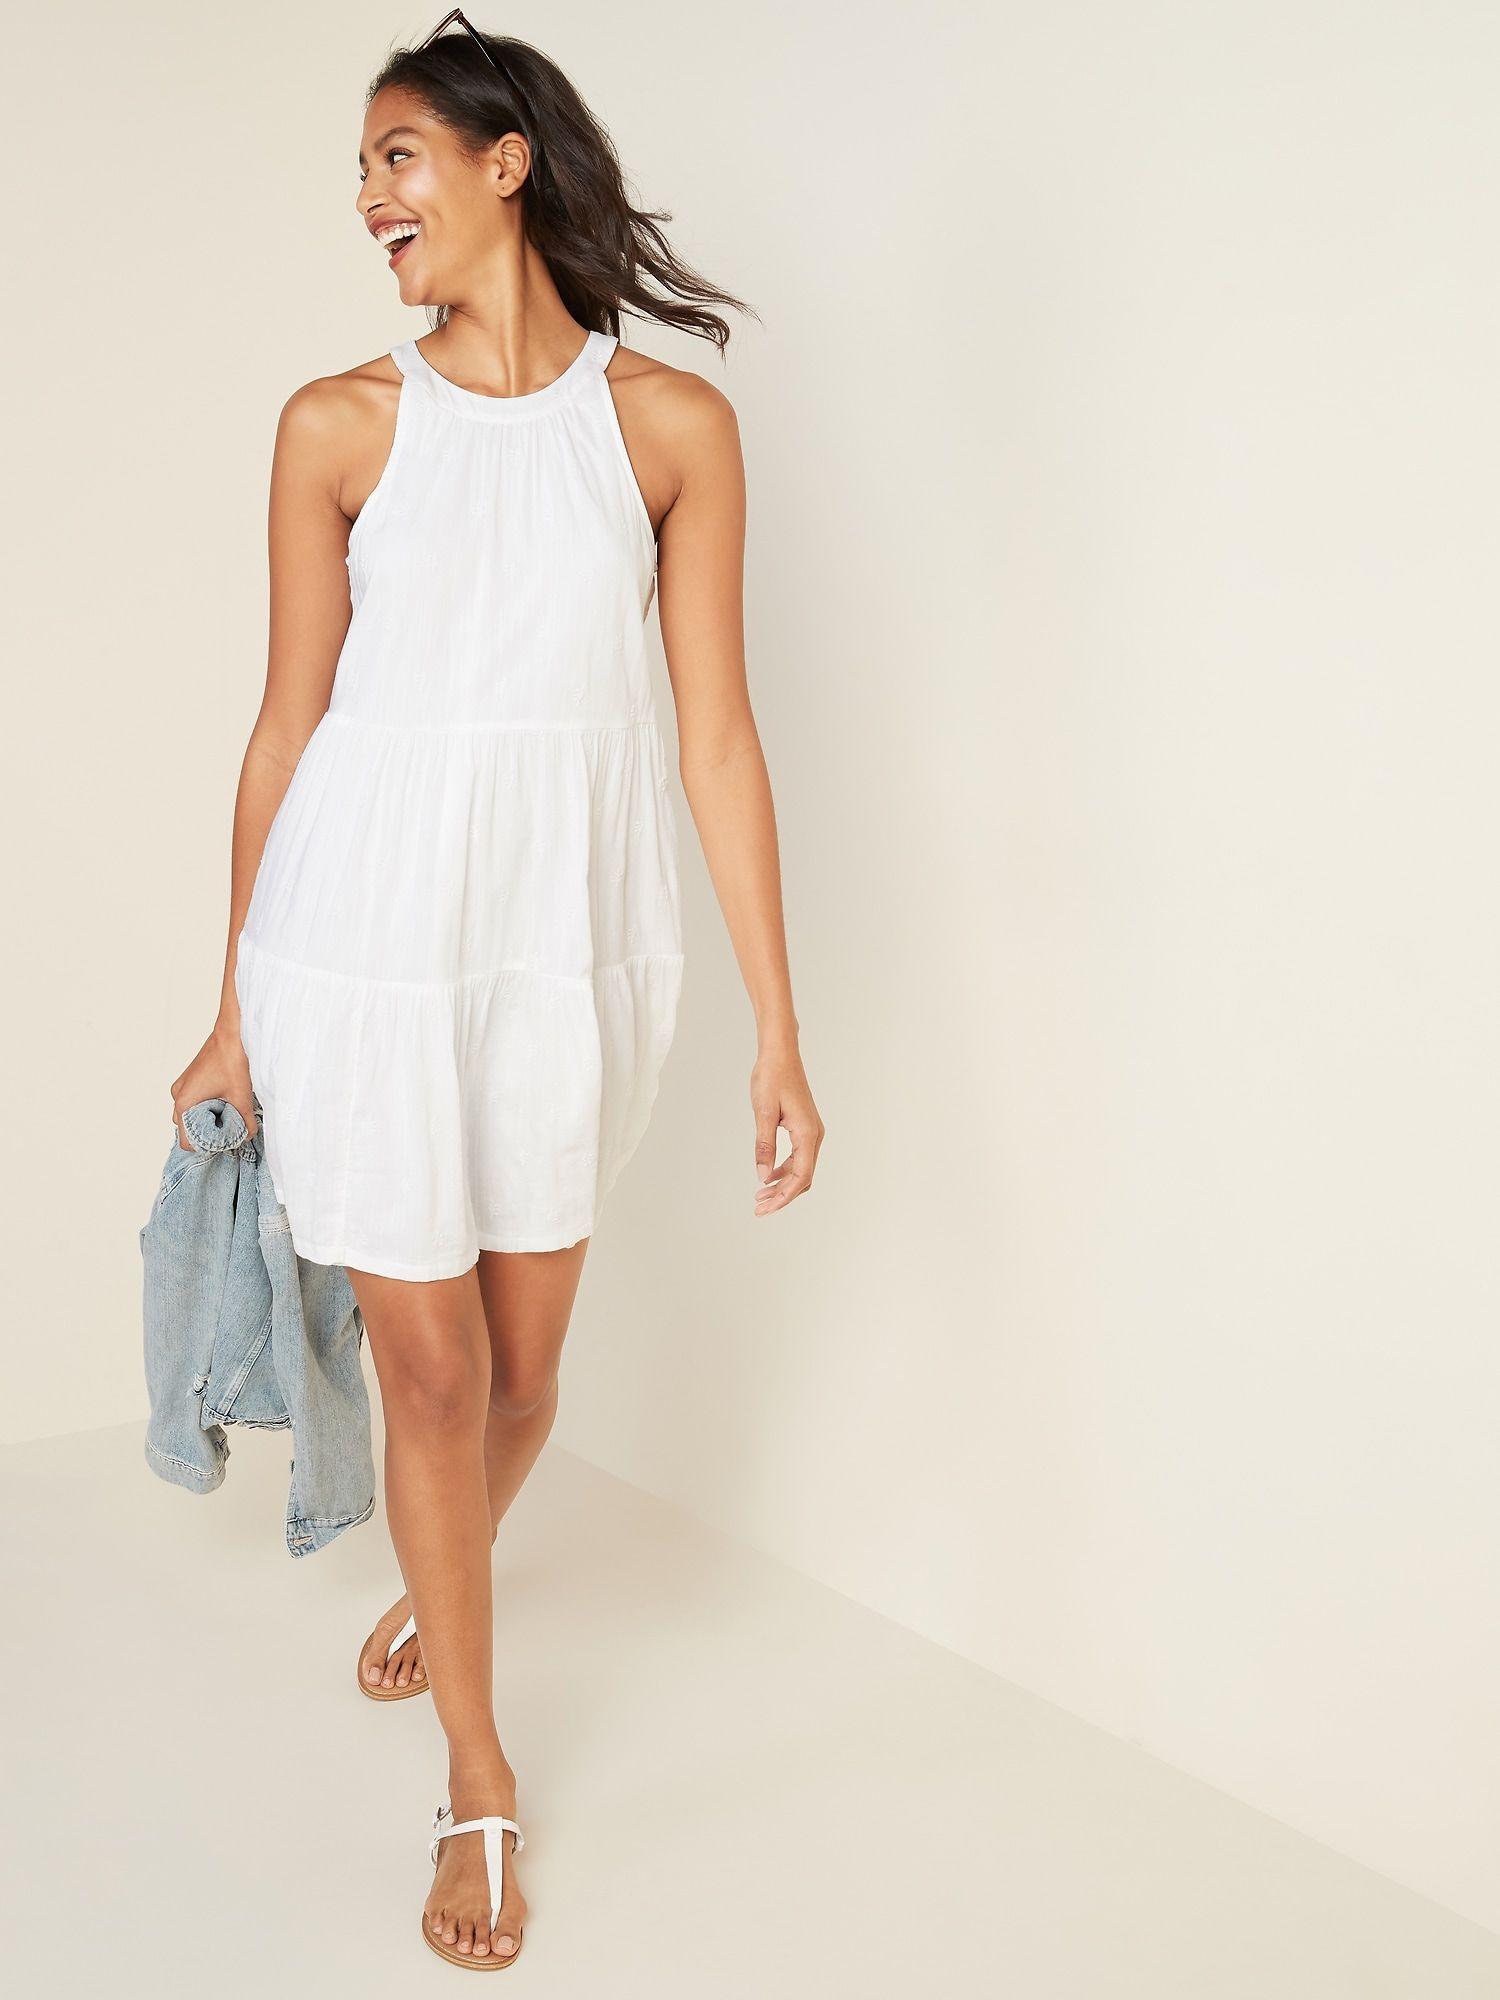 45++ Old navy white dress information